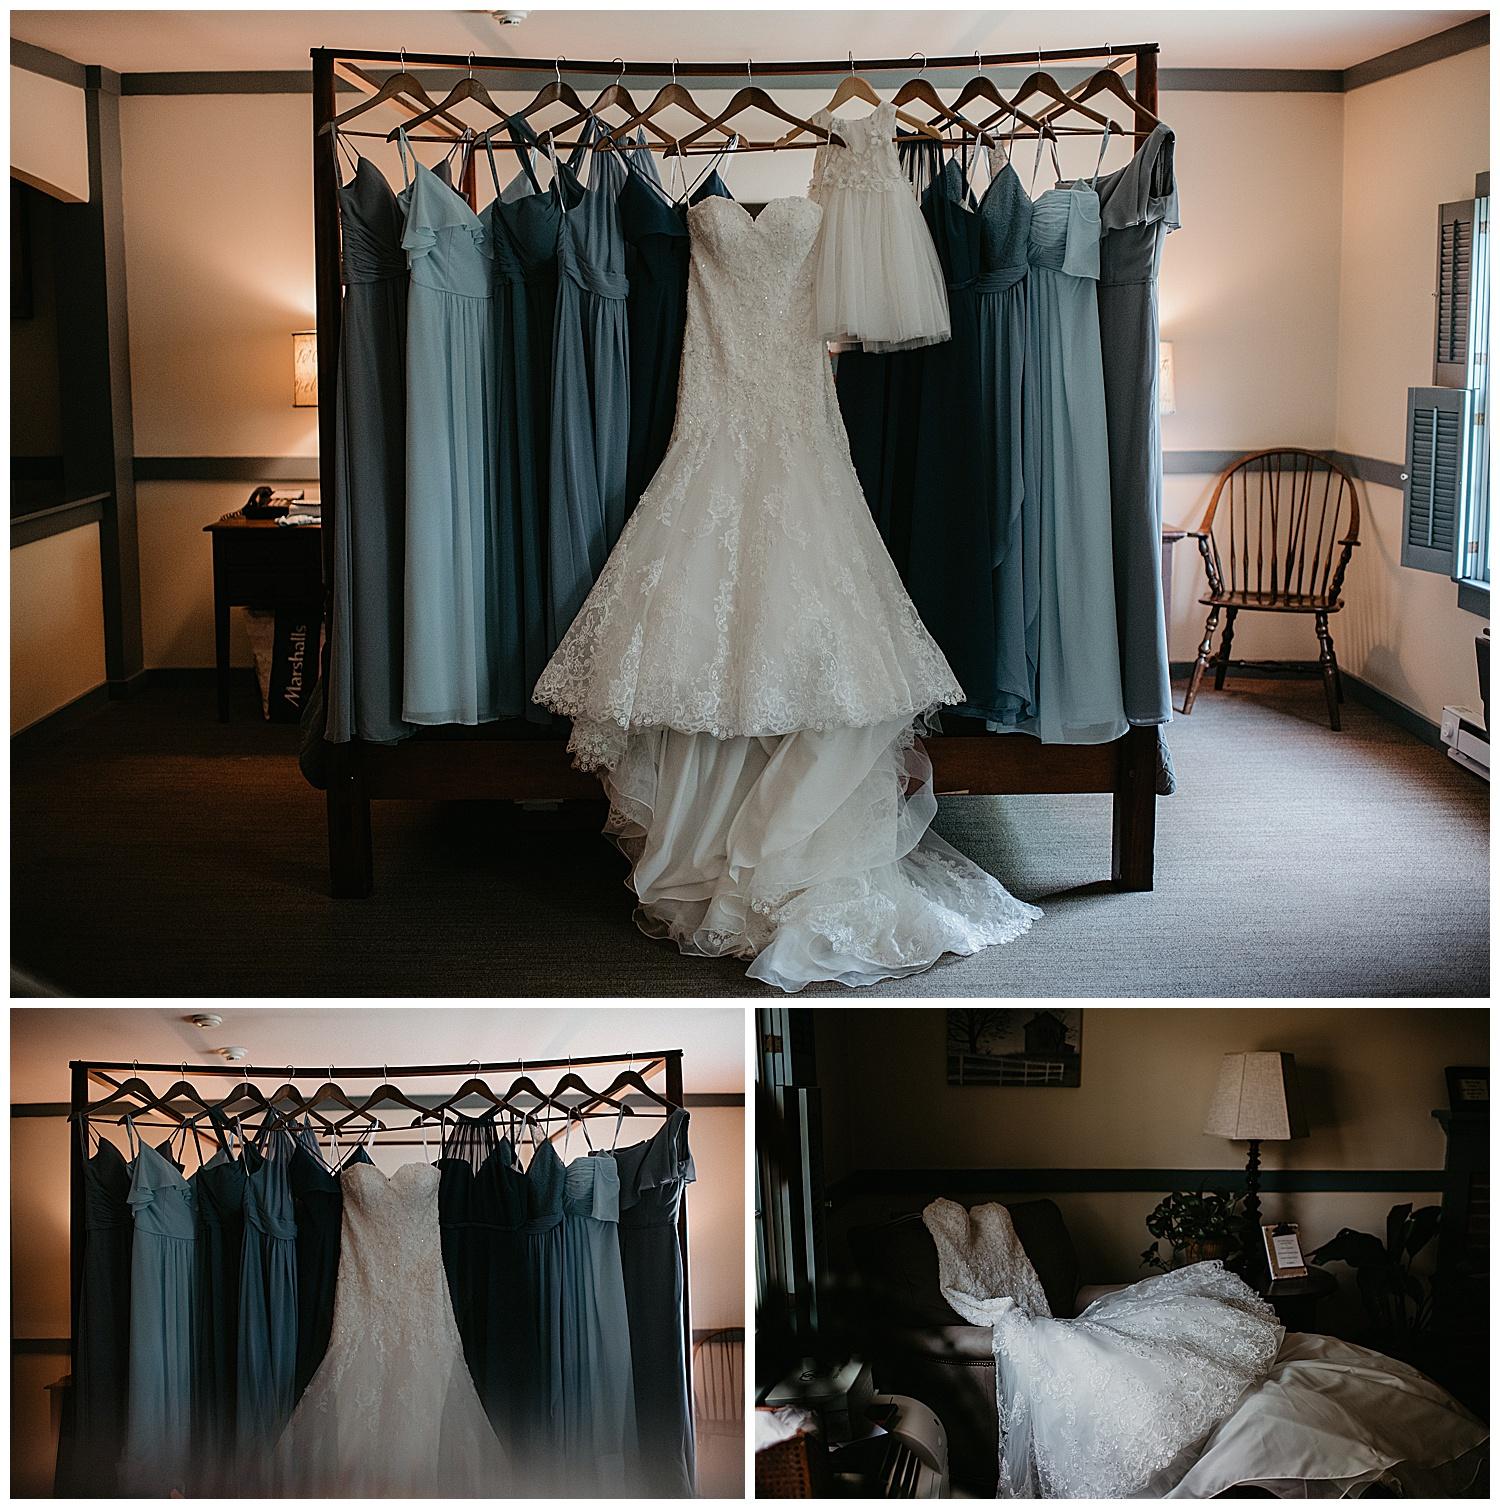 NEPA-Bloomsburg-Wedding-Photographer-at-The-Barn-at-Boones-Dam-Bloomsburg-PA_0001.jpg